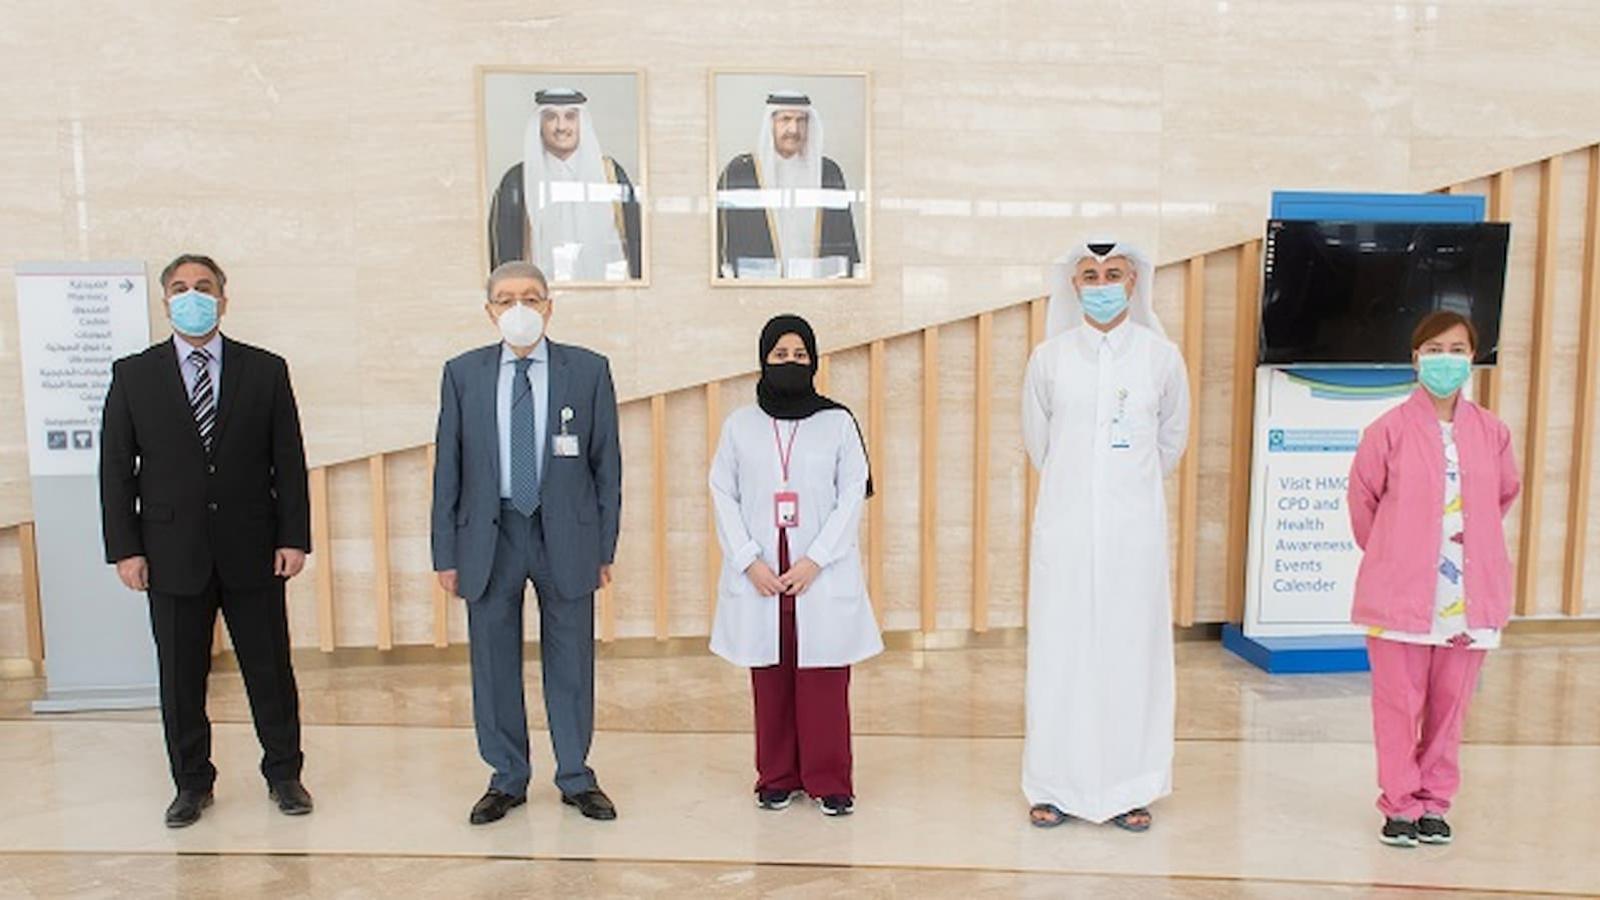 Qatar Neonatal Transport Program successfully transports hundreds of newborns for tertiary care